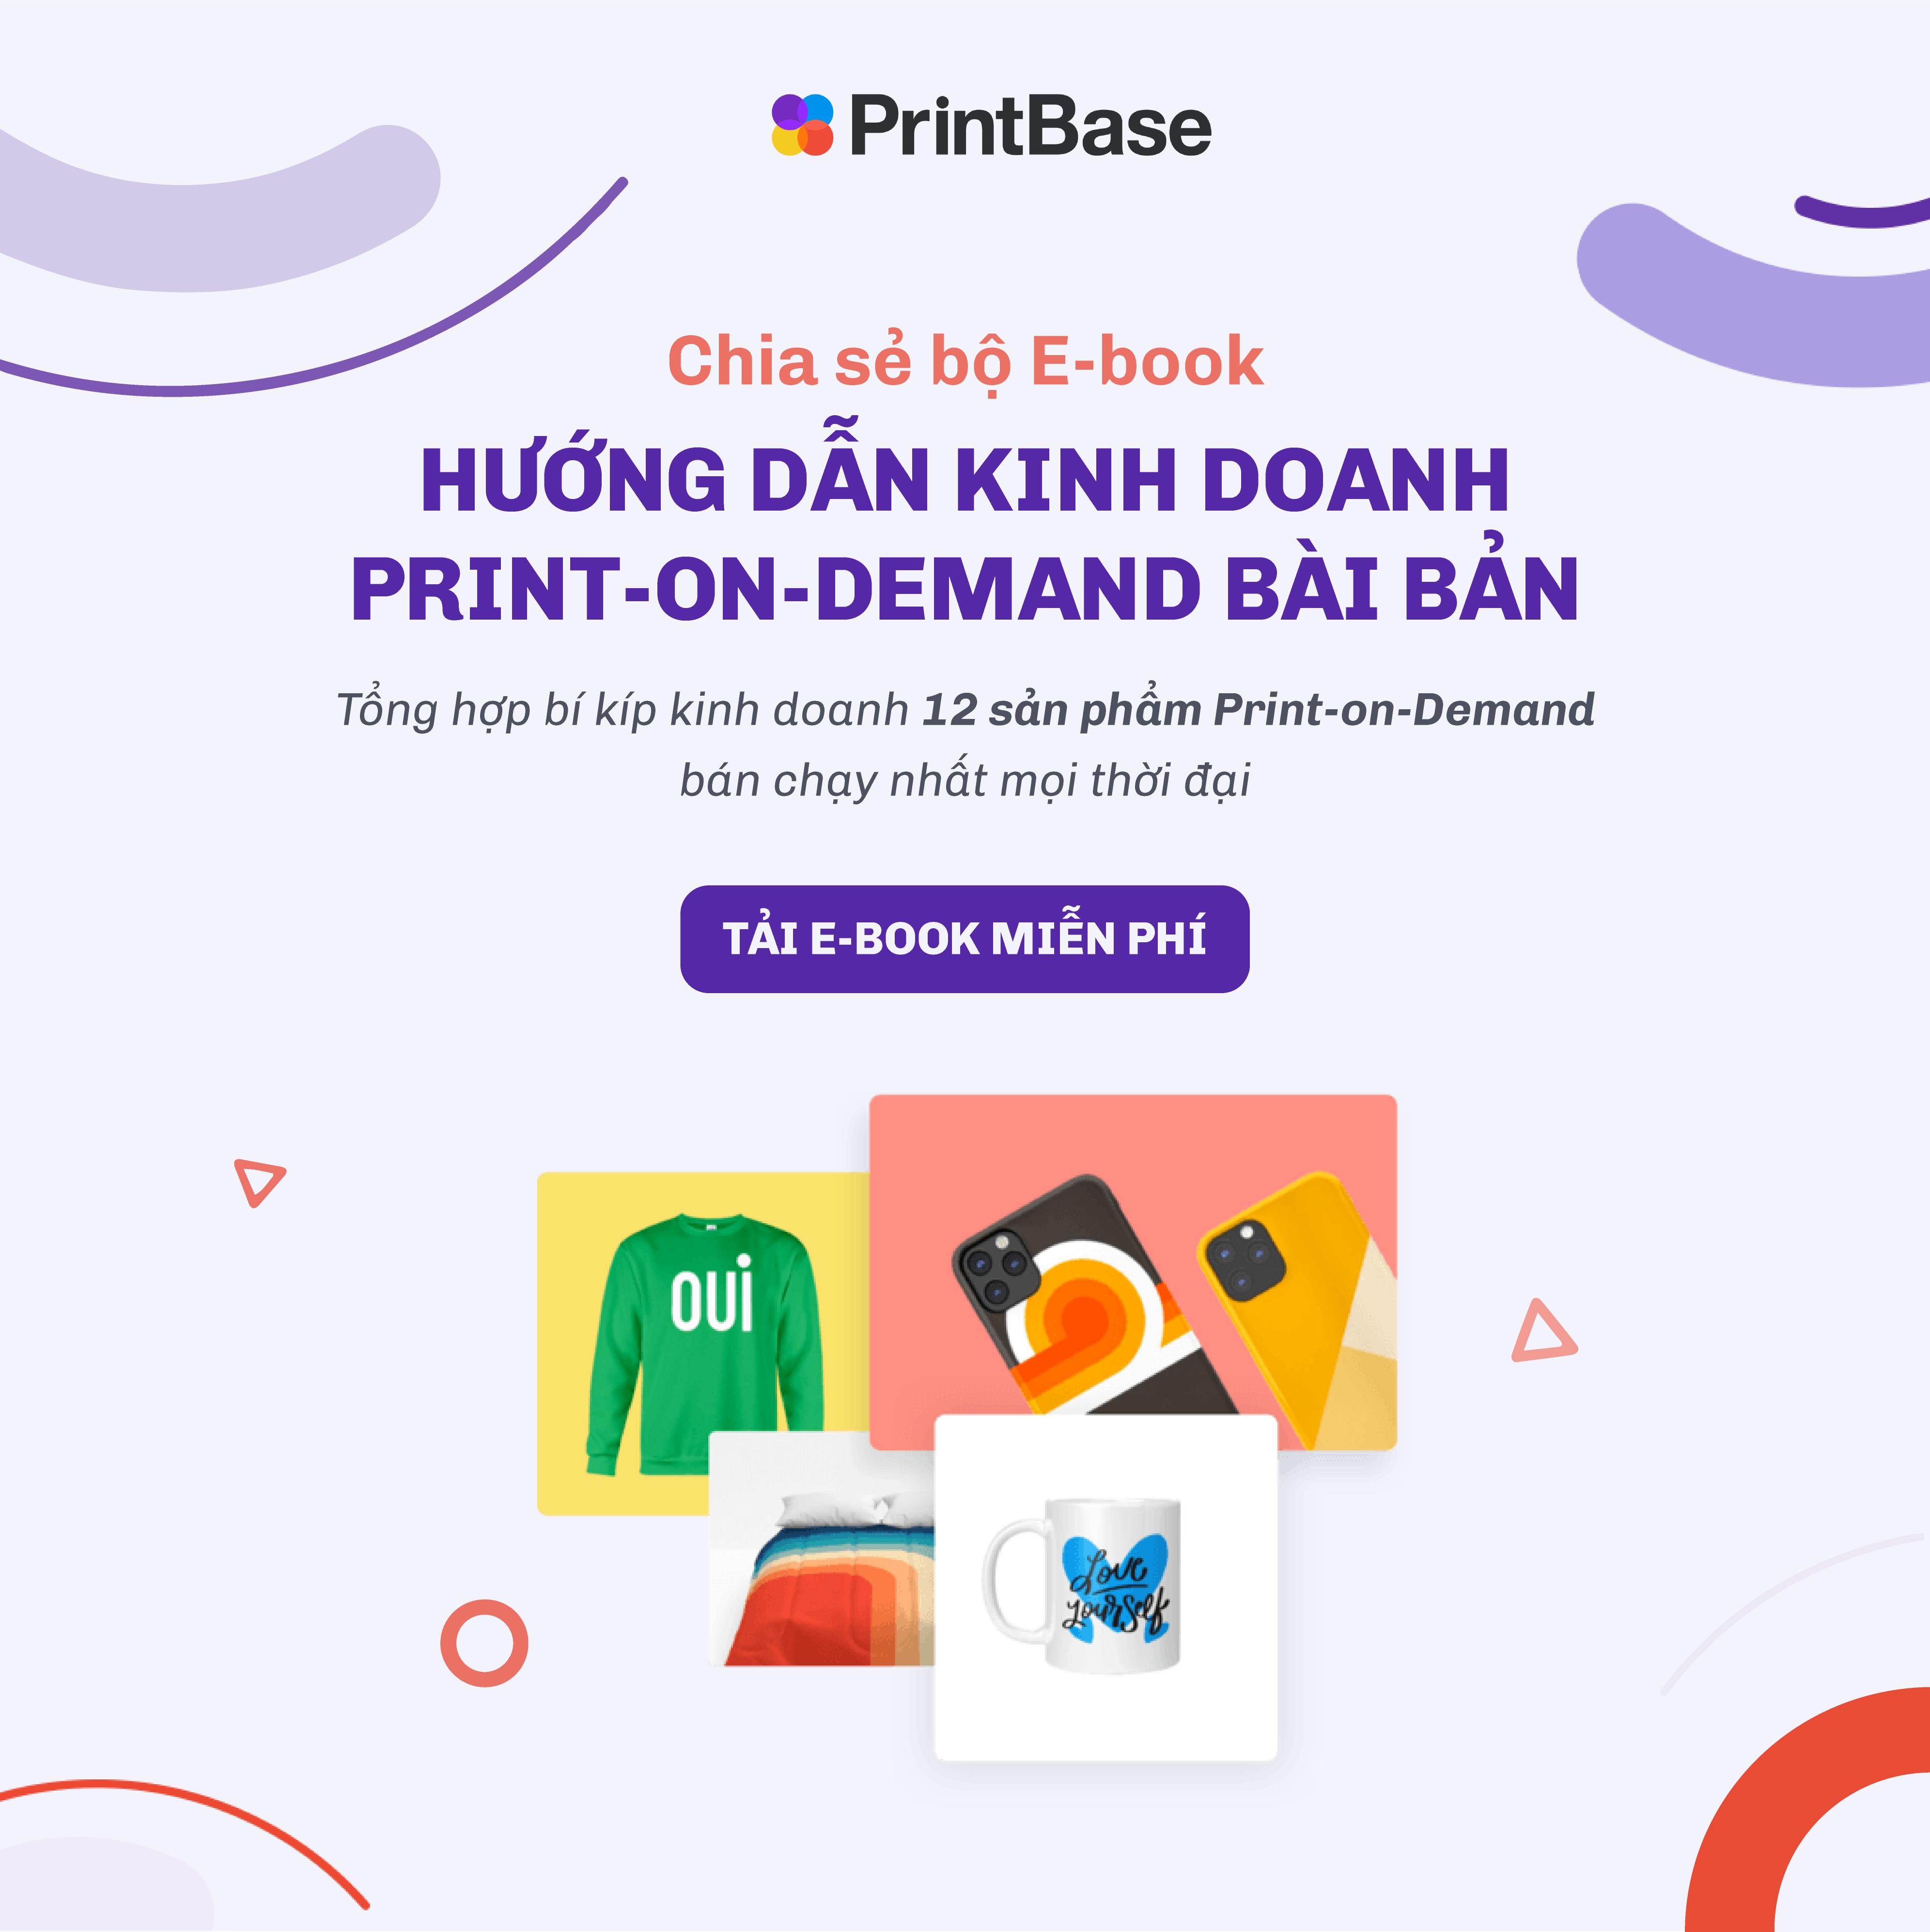 printbase-print-on-demand-ebook-2